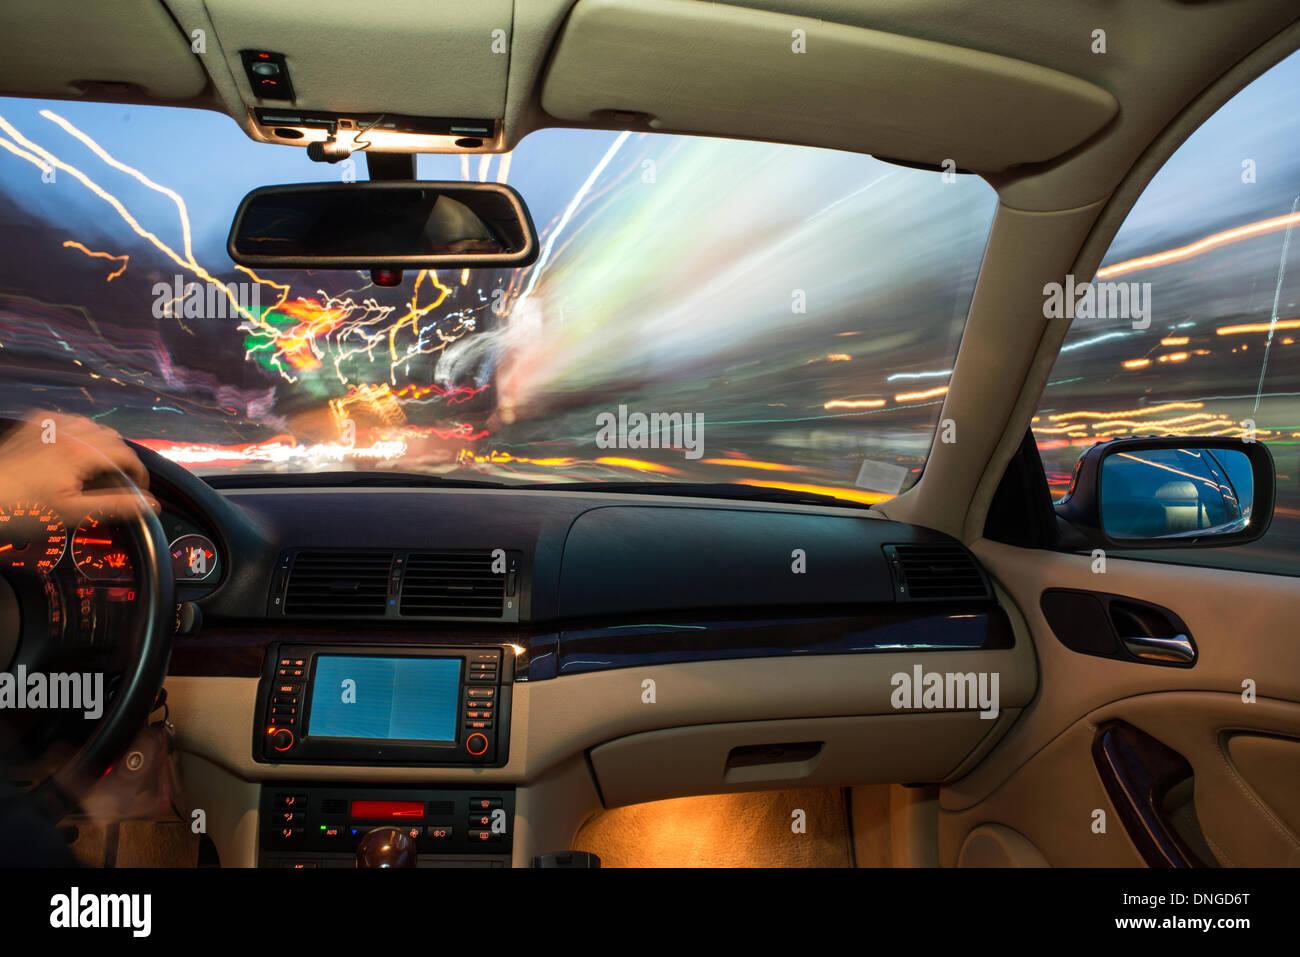 car interior on driving blurred night lights stock photo 64900496 alamy. Black Bedroom Furniture Sets. Home Design Ideas